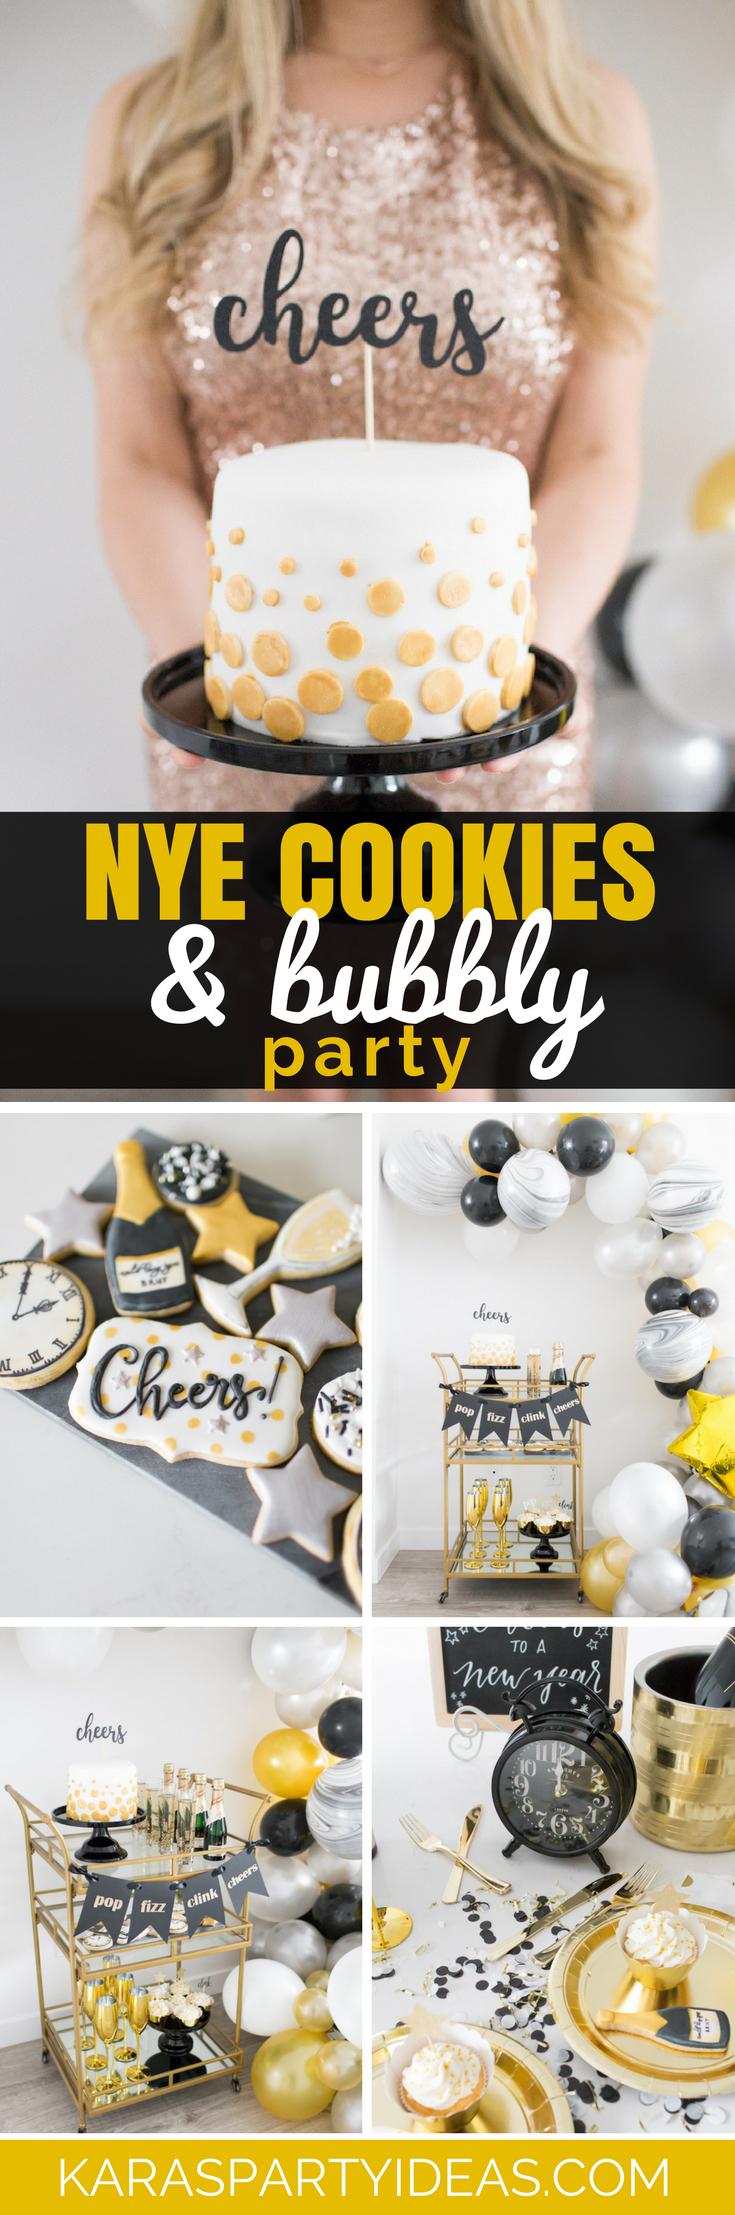 NYE Cookies and Bubbly Party via Kara's Party Ideas - KarasPartyIdeas.com